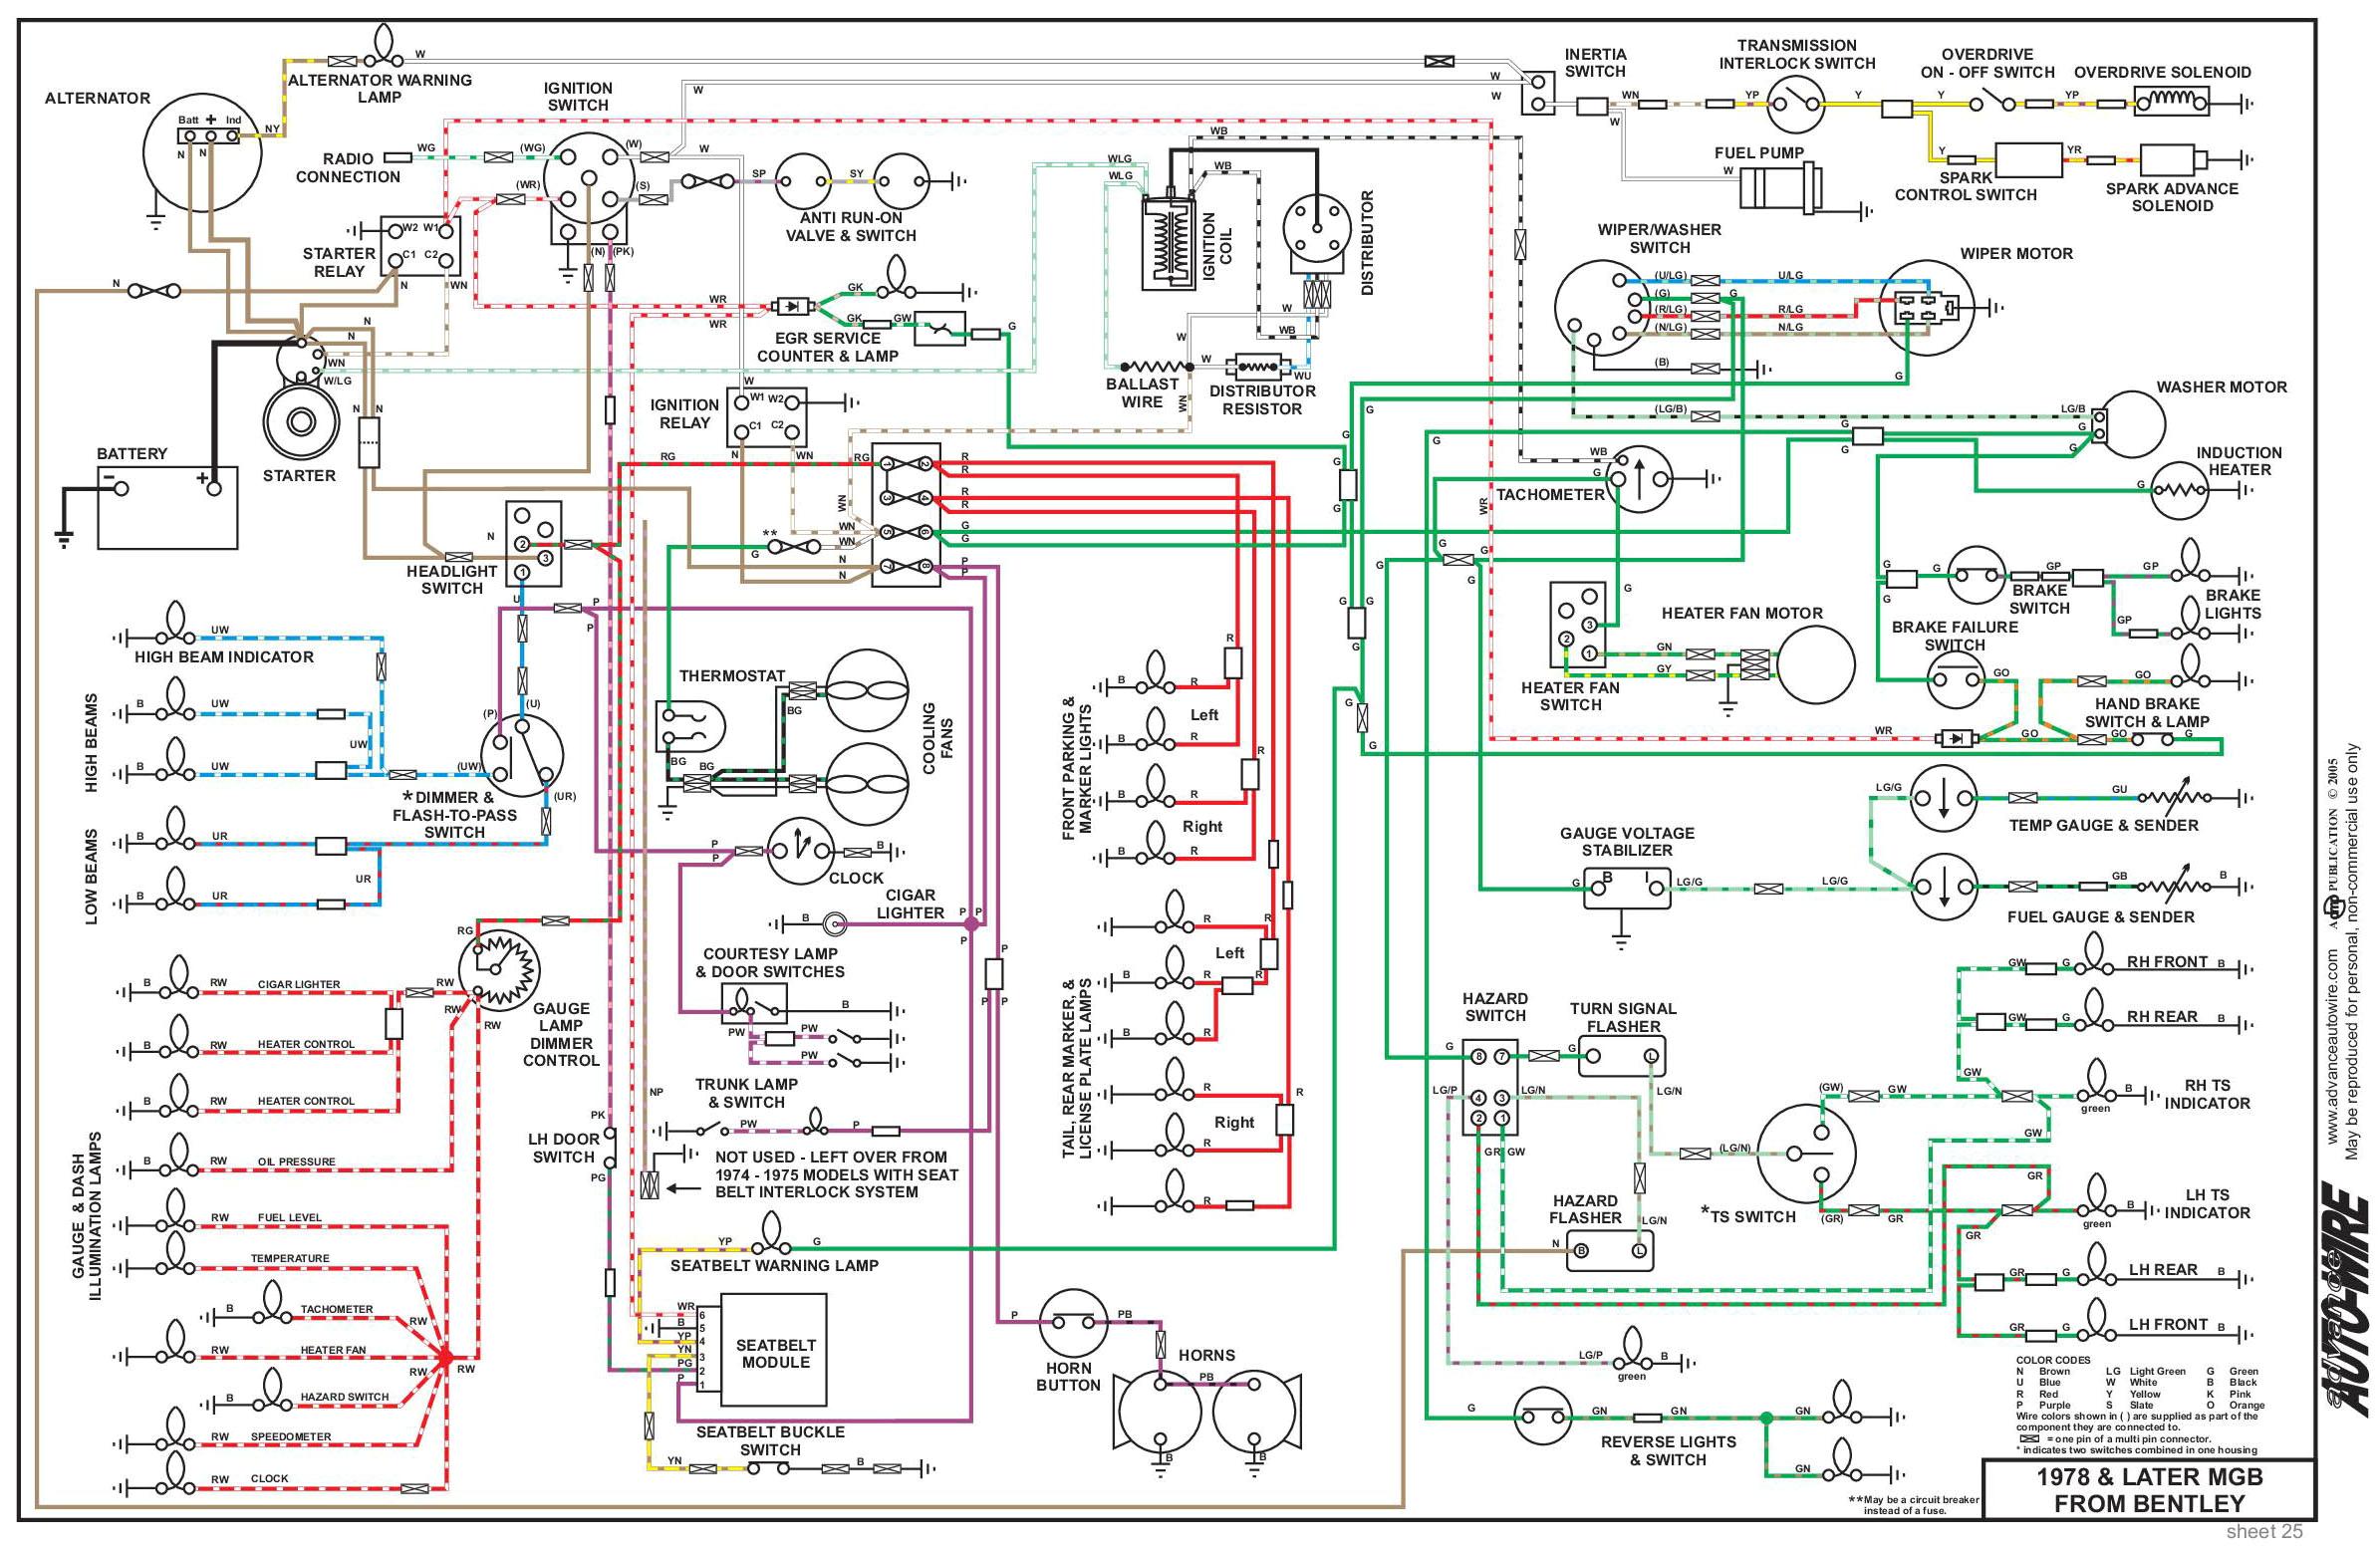 mgb wiring diagram wiring diagram sys mgb wiring diagram pdf mgb wiring diagram